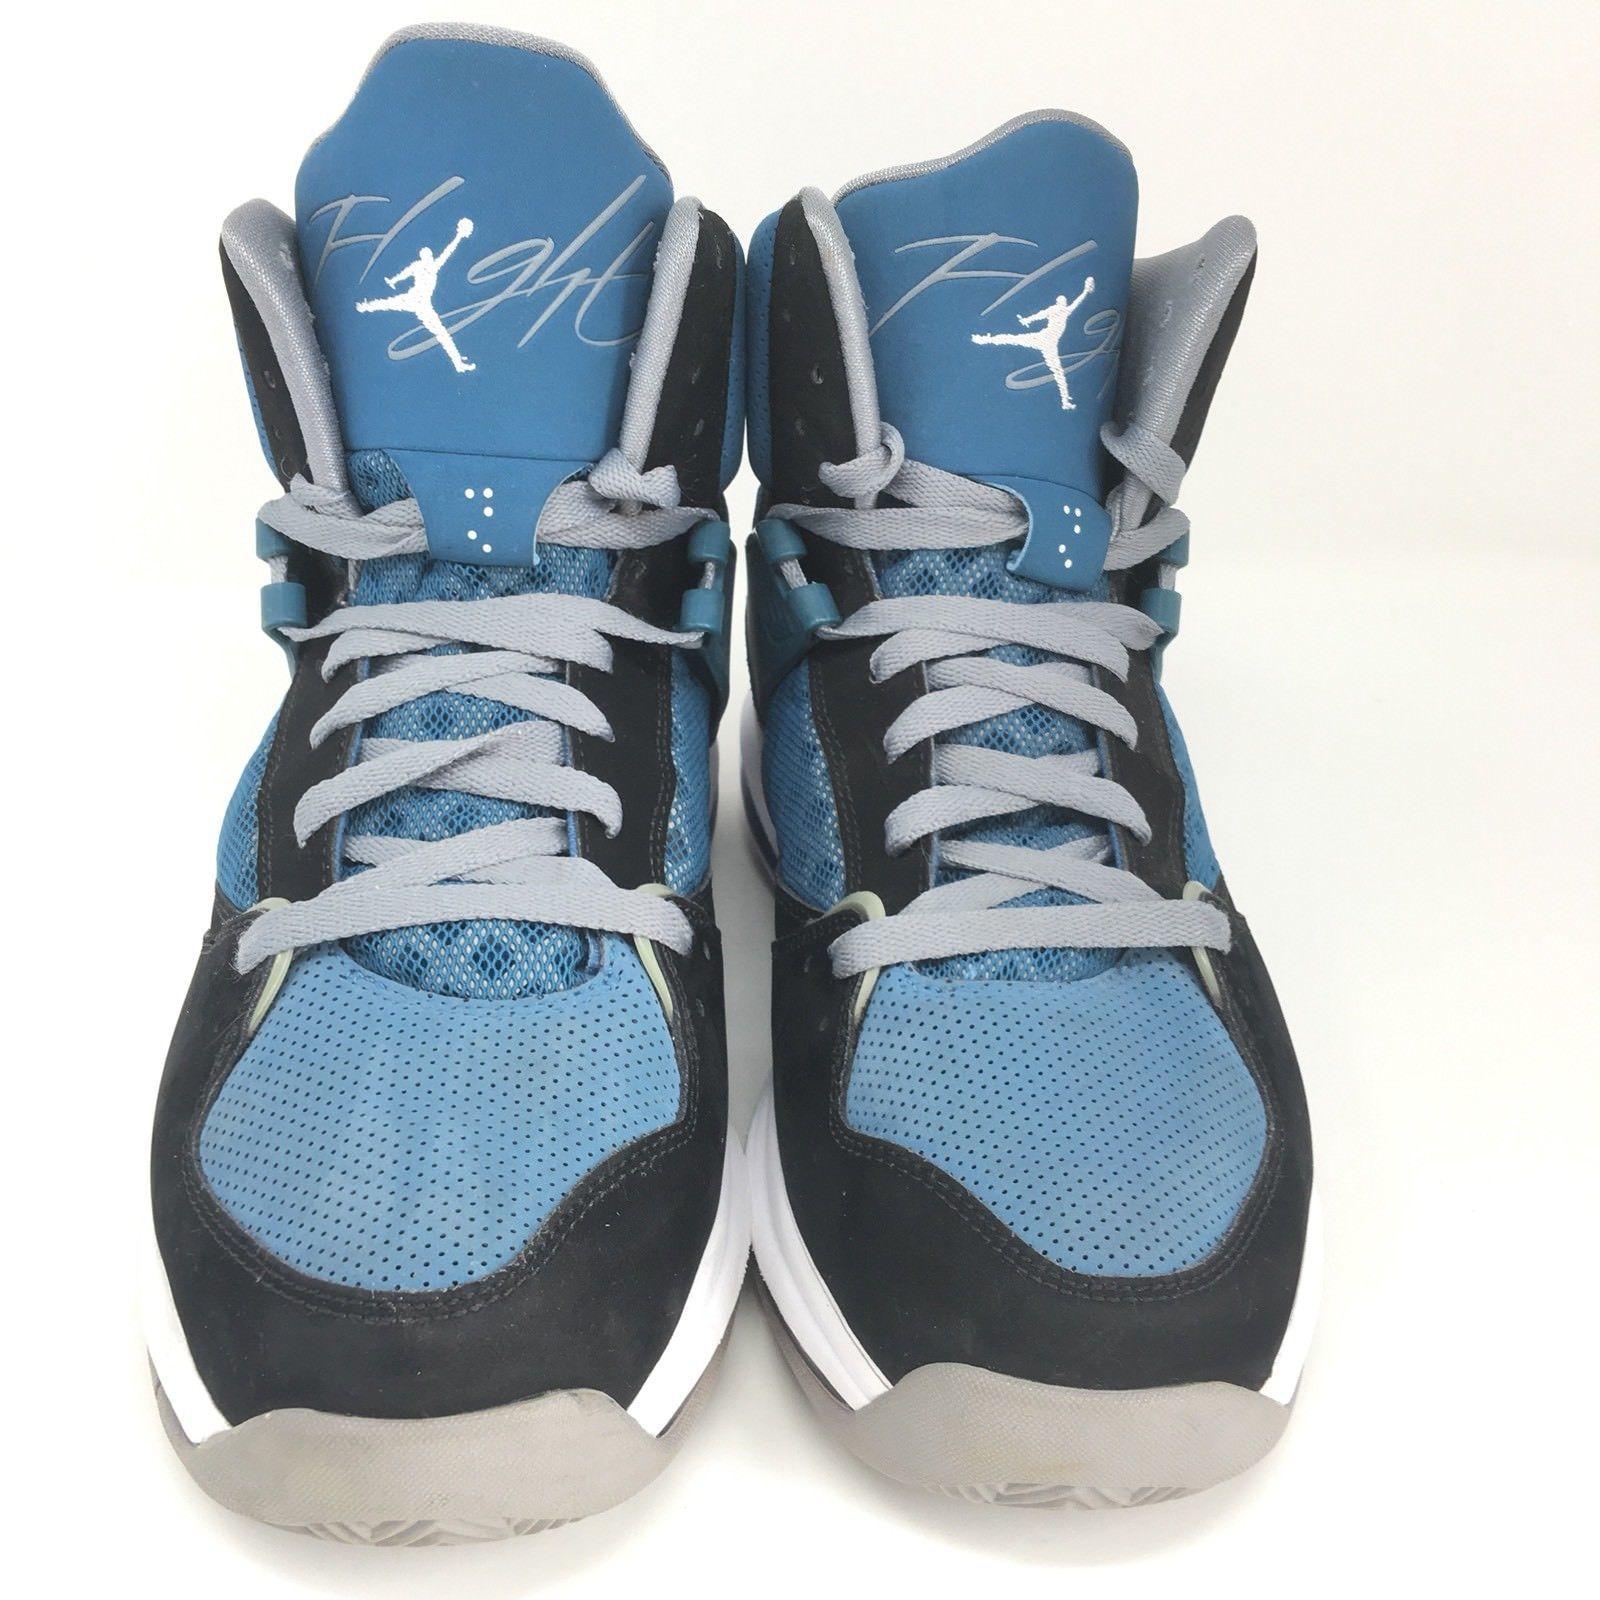 quality design 4248d 35d2c ... Nike Air Jordan Flight 45 Hi Max Dwayne Wade Basketball Shoes 524866-007  Size 9 ...